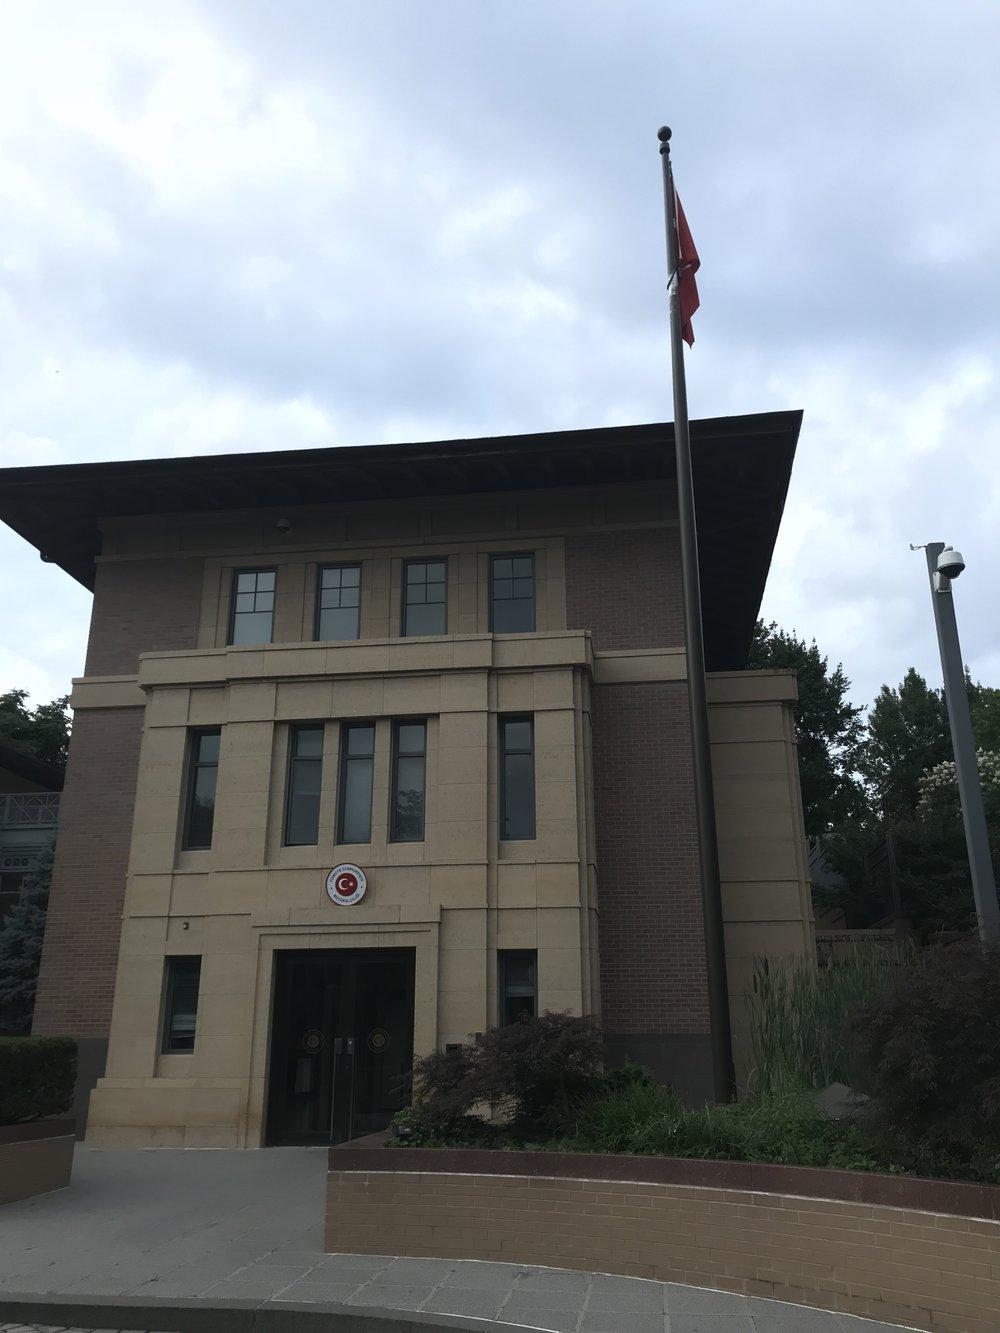 The Embassy of Turkey.